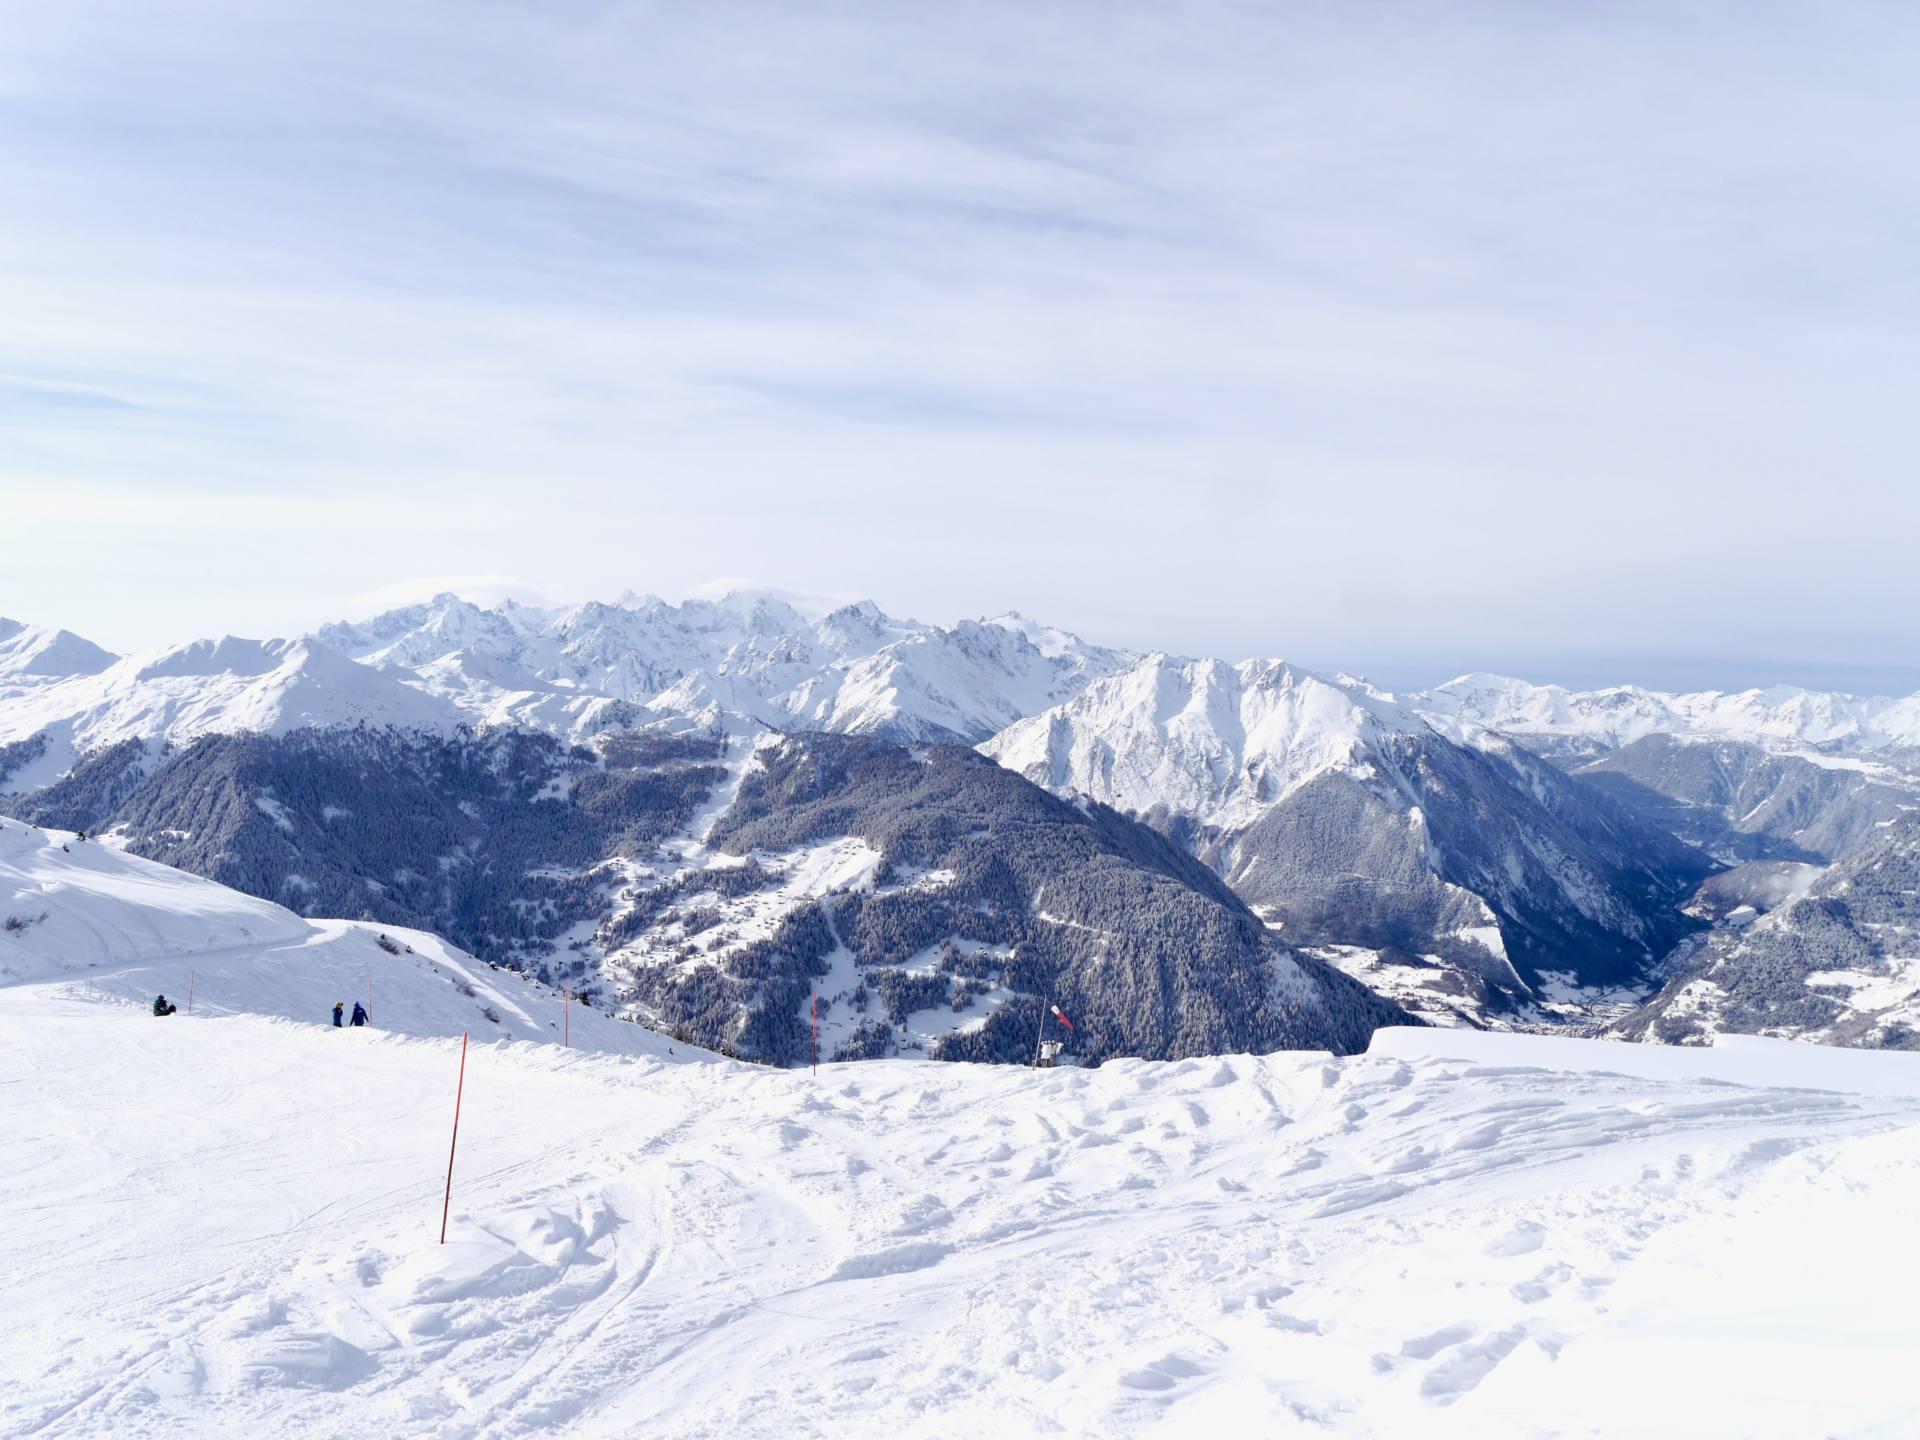 a winter resort guide to verbier, switzerland | the travelista